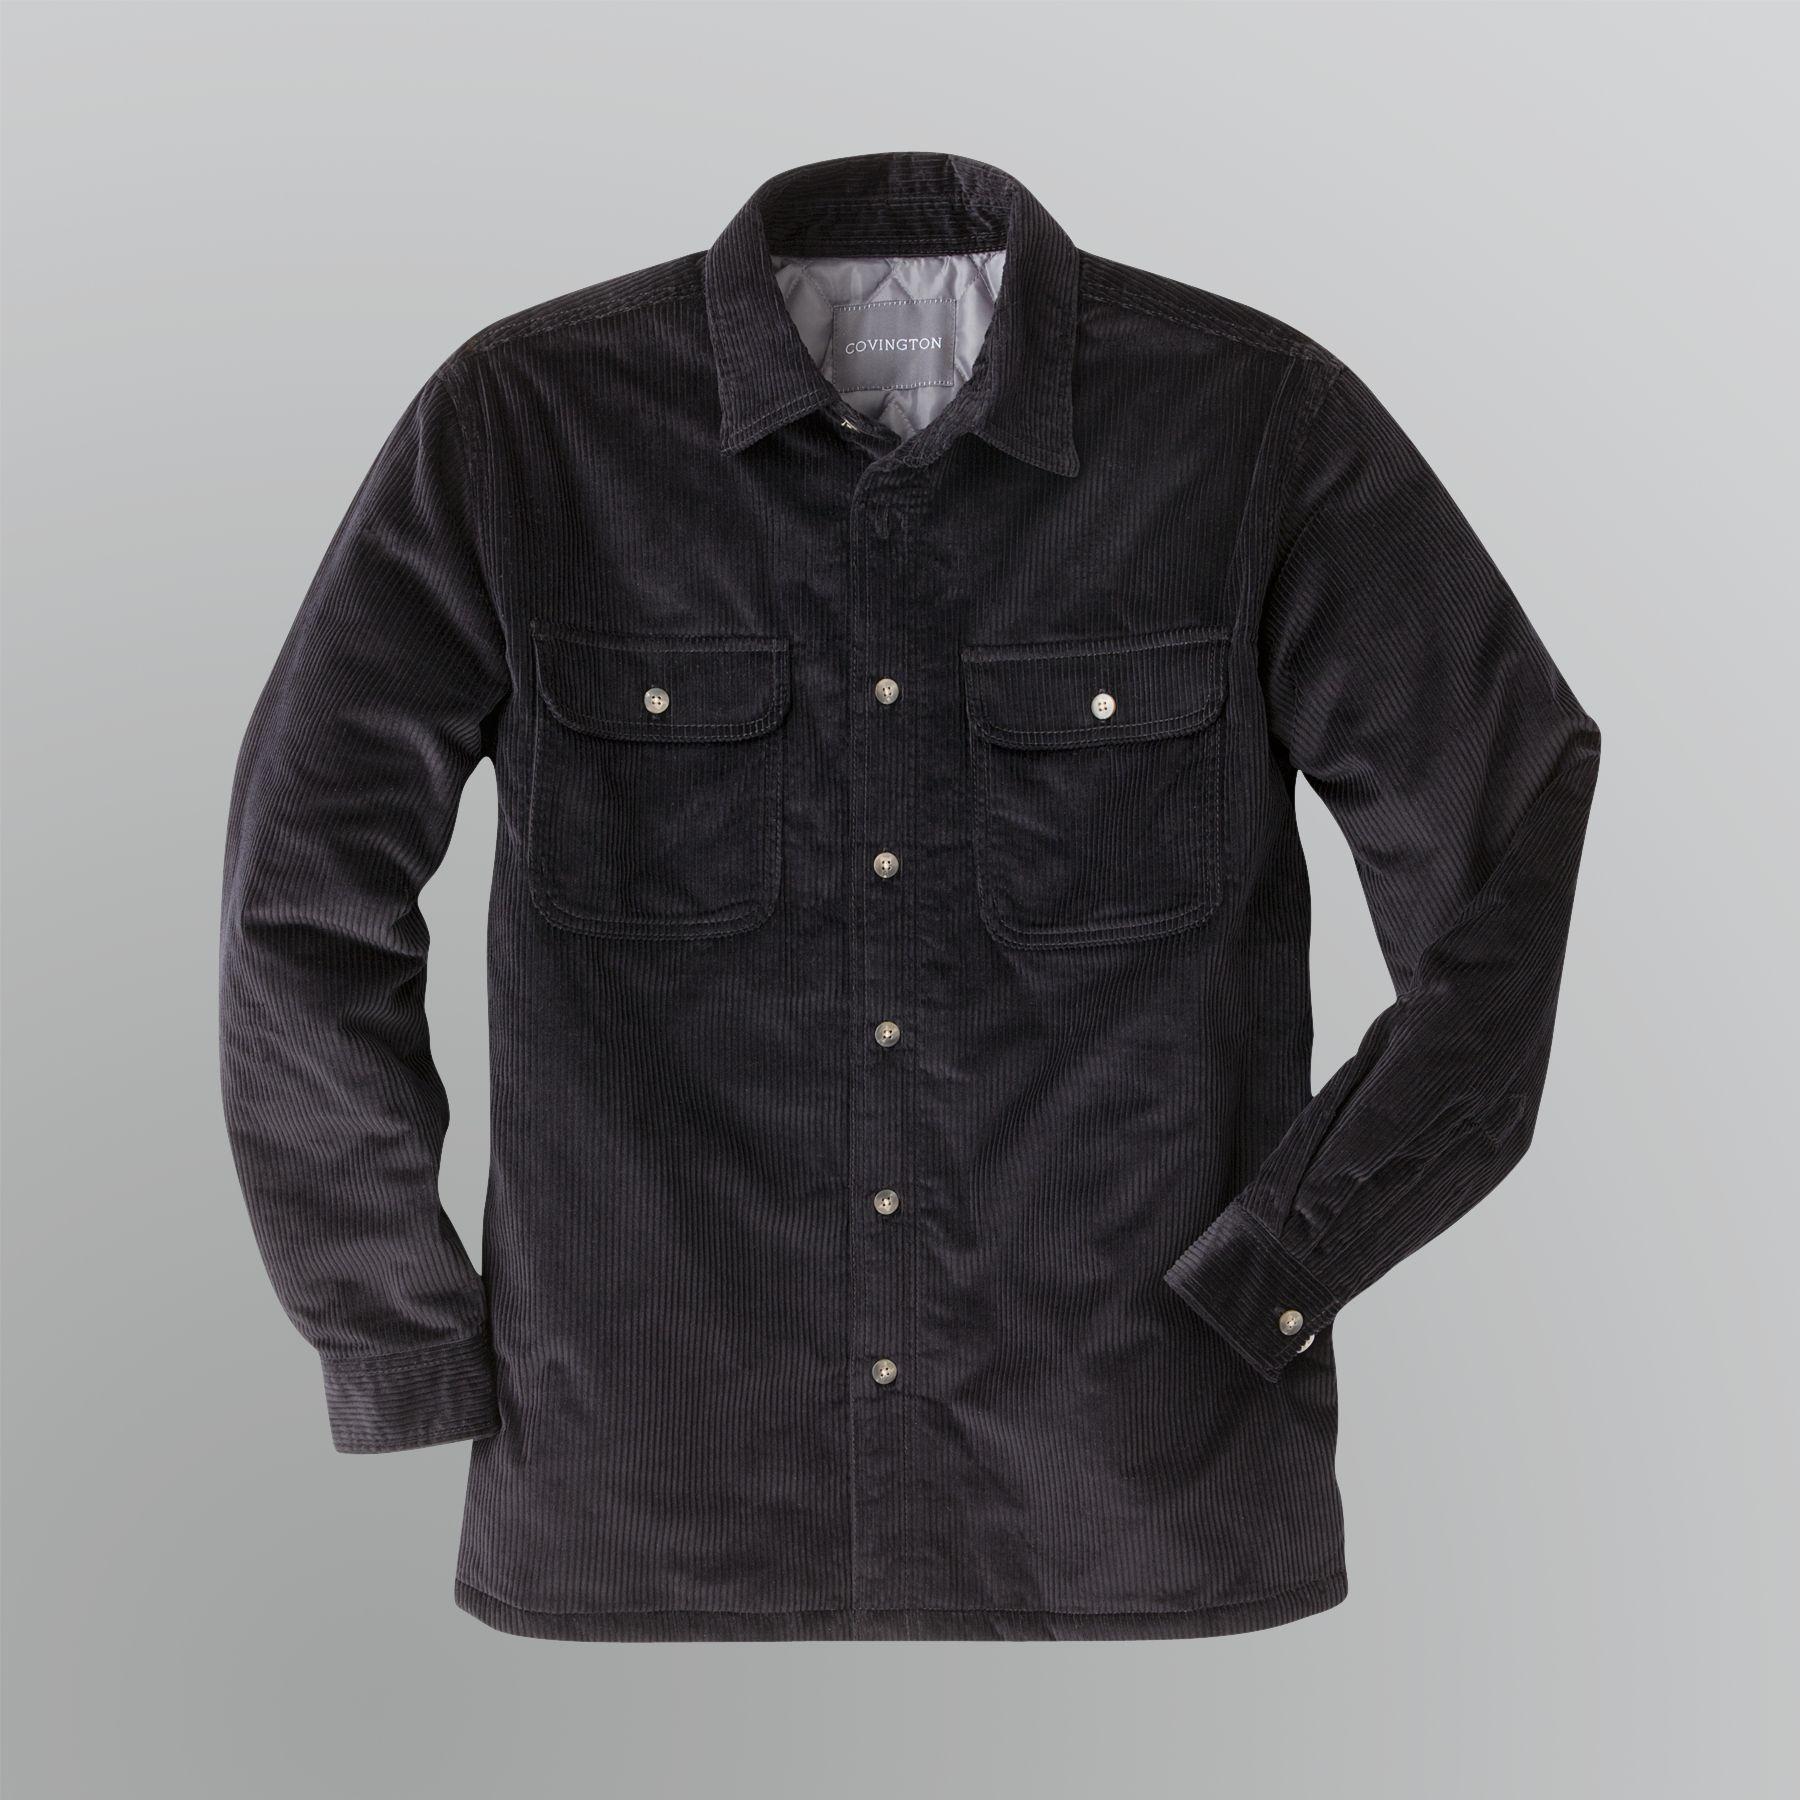 Covington Mens Corduroy Shirt Jacket